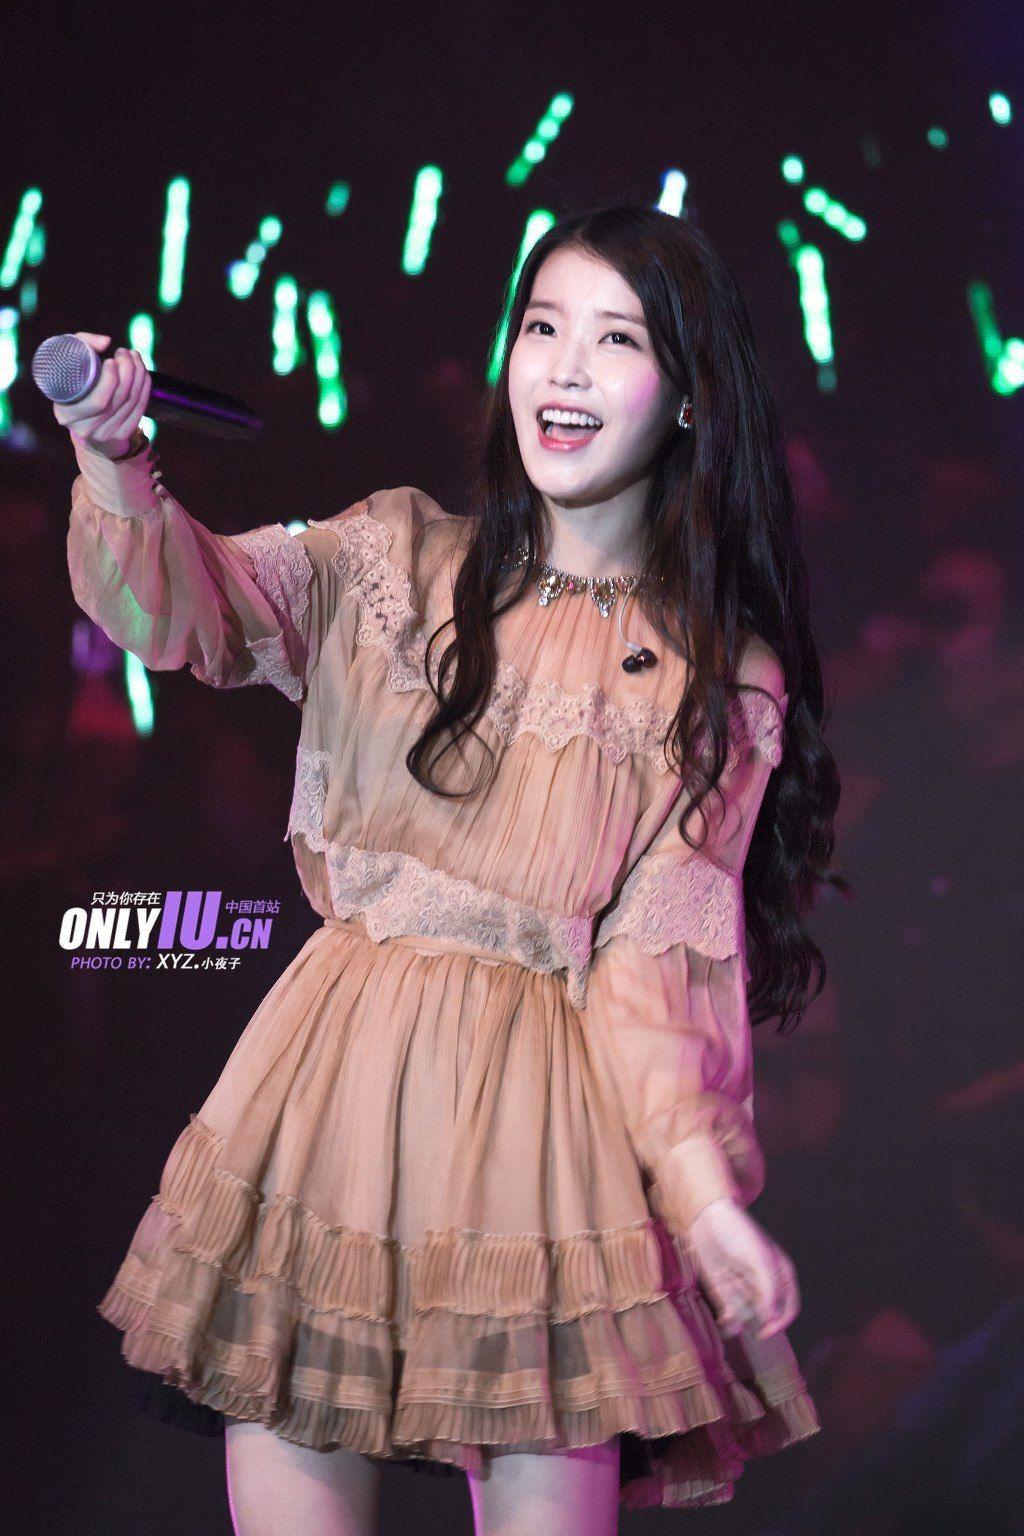 6f2b3e85cc2708f48ebe997ae8b3f93e Kpop Girls Kpop Fashion Korean Outfits